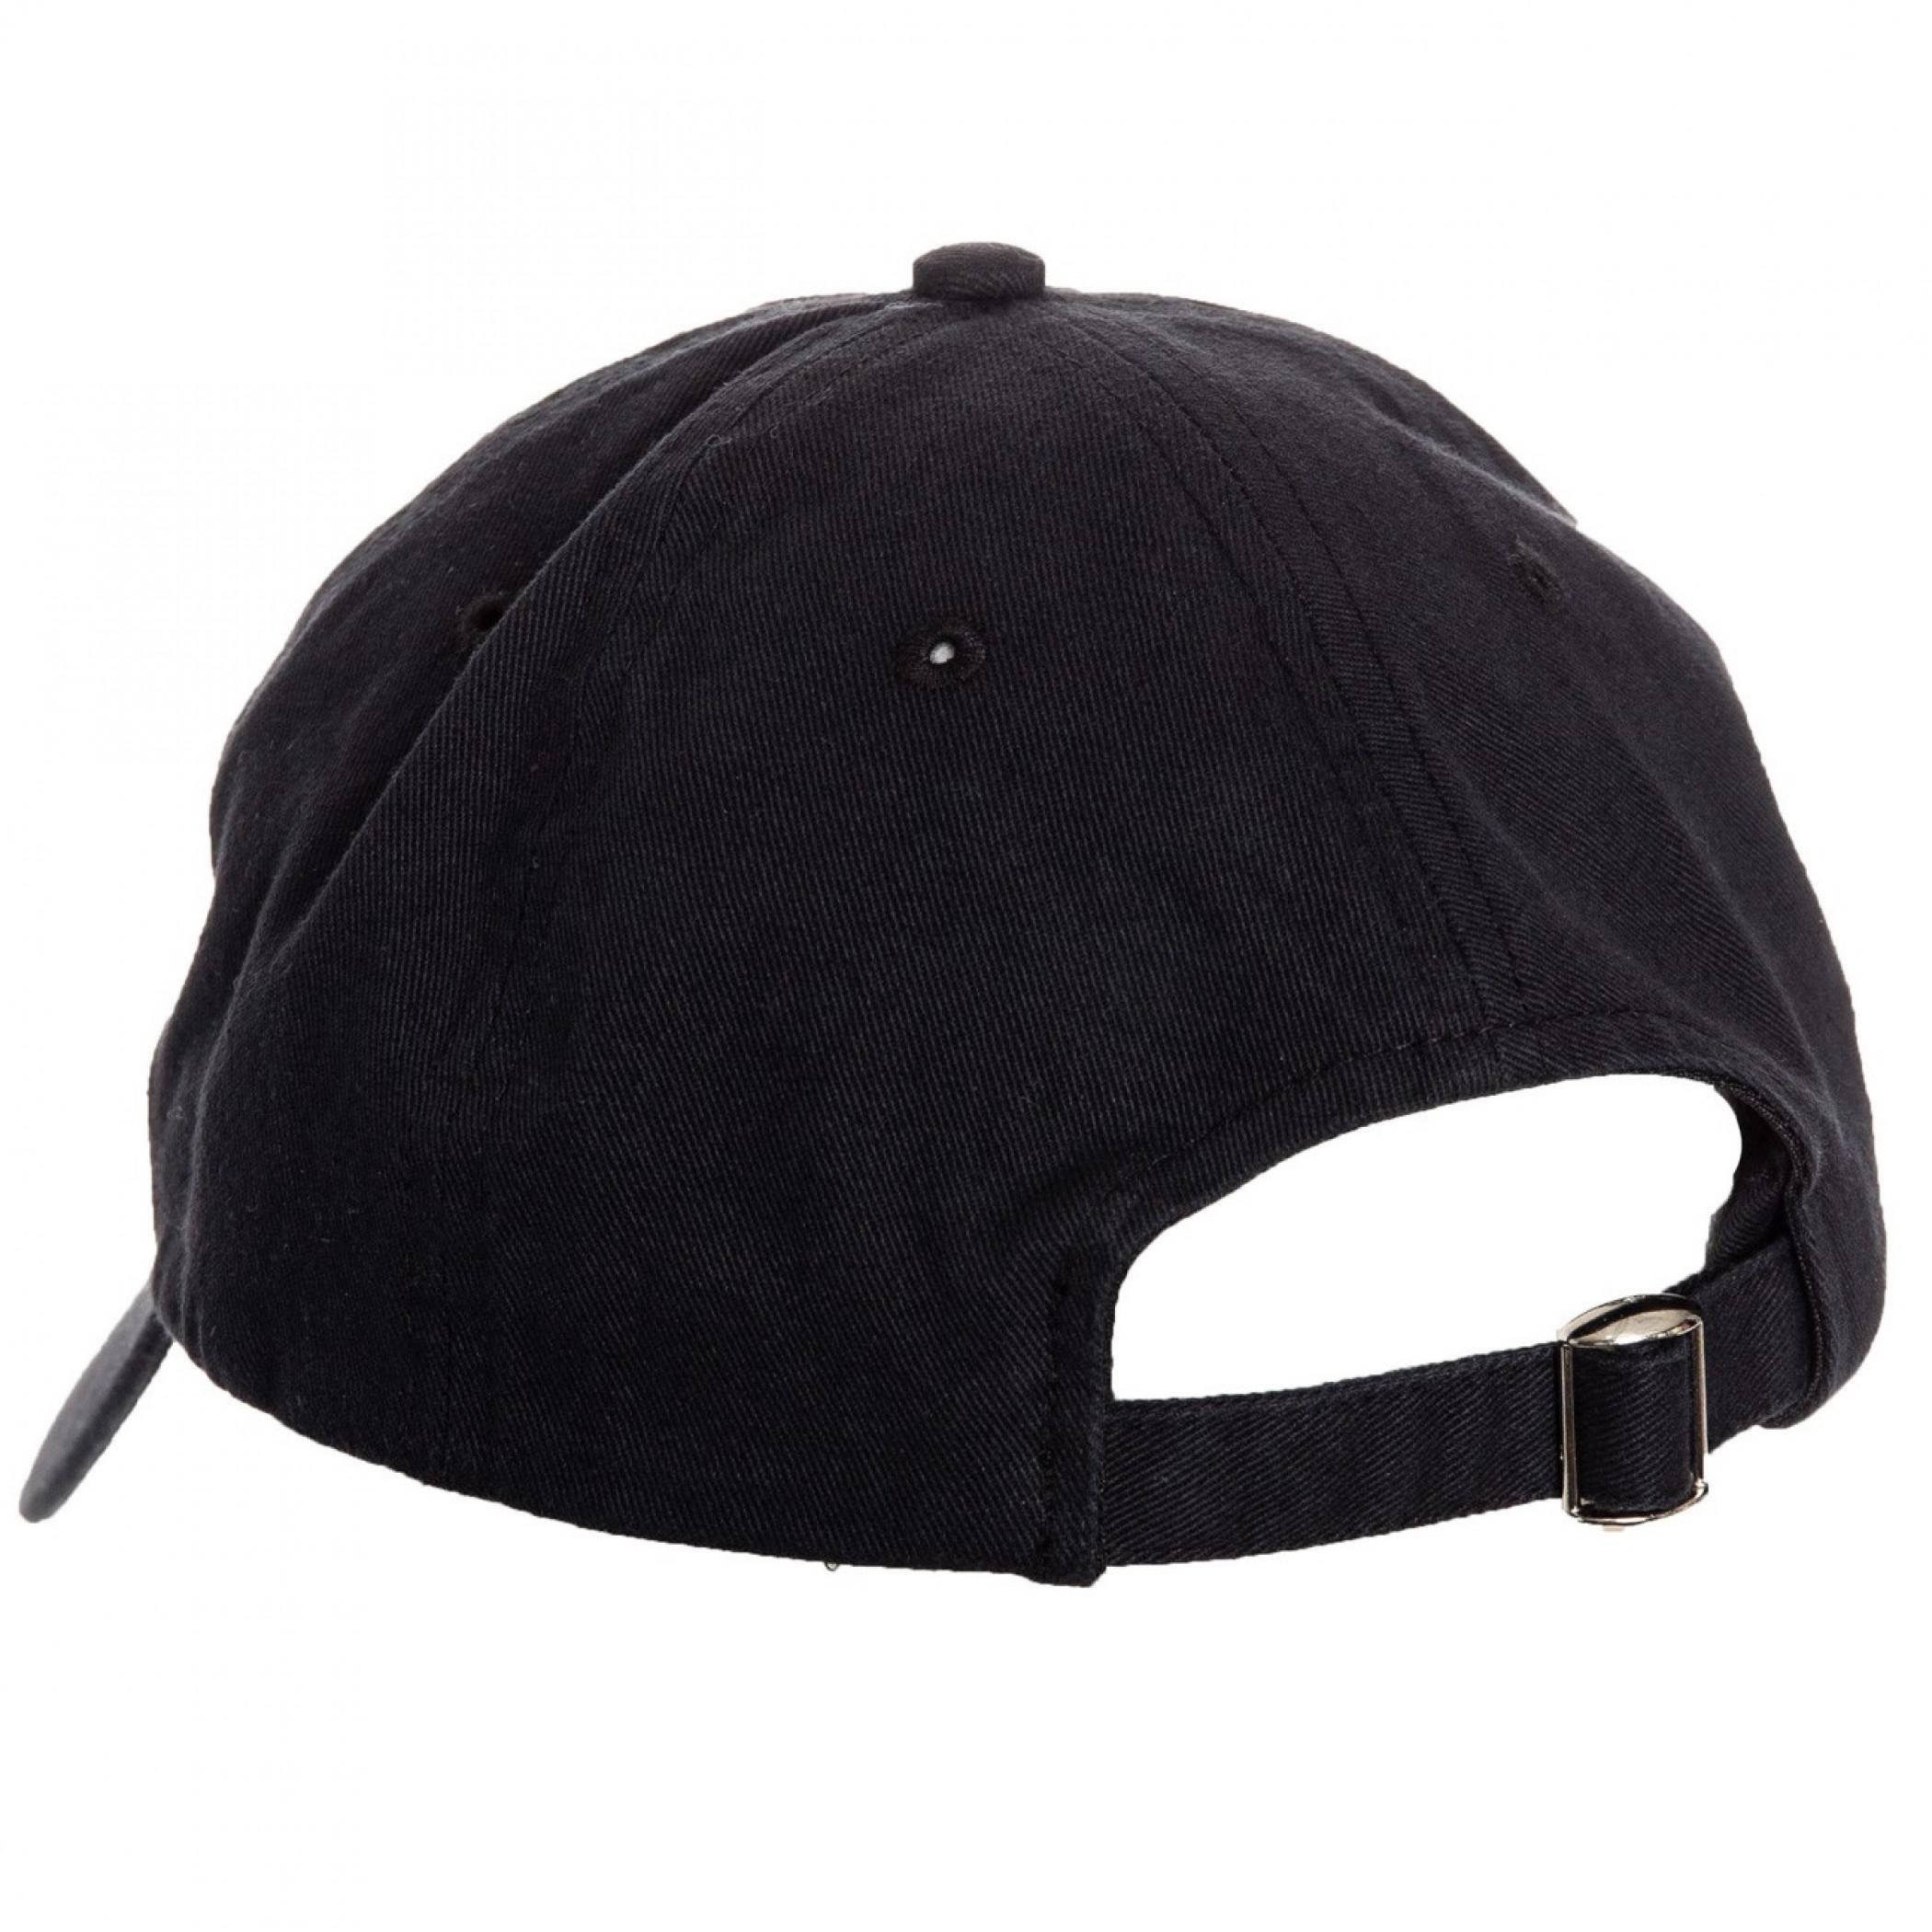 Corona Extra Dark Adjustable Strapback Dad Hat